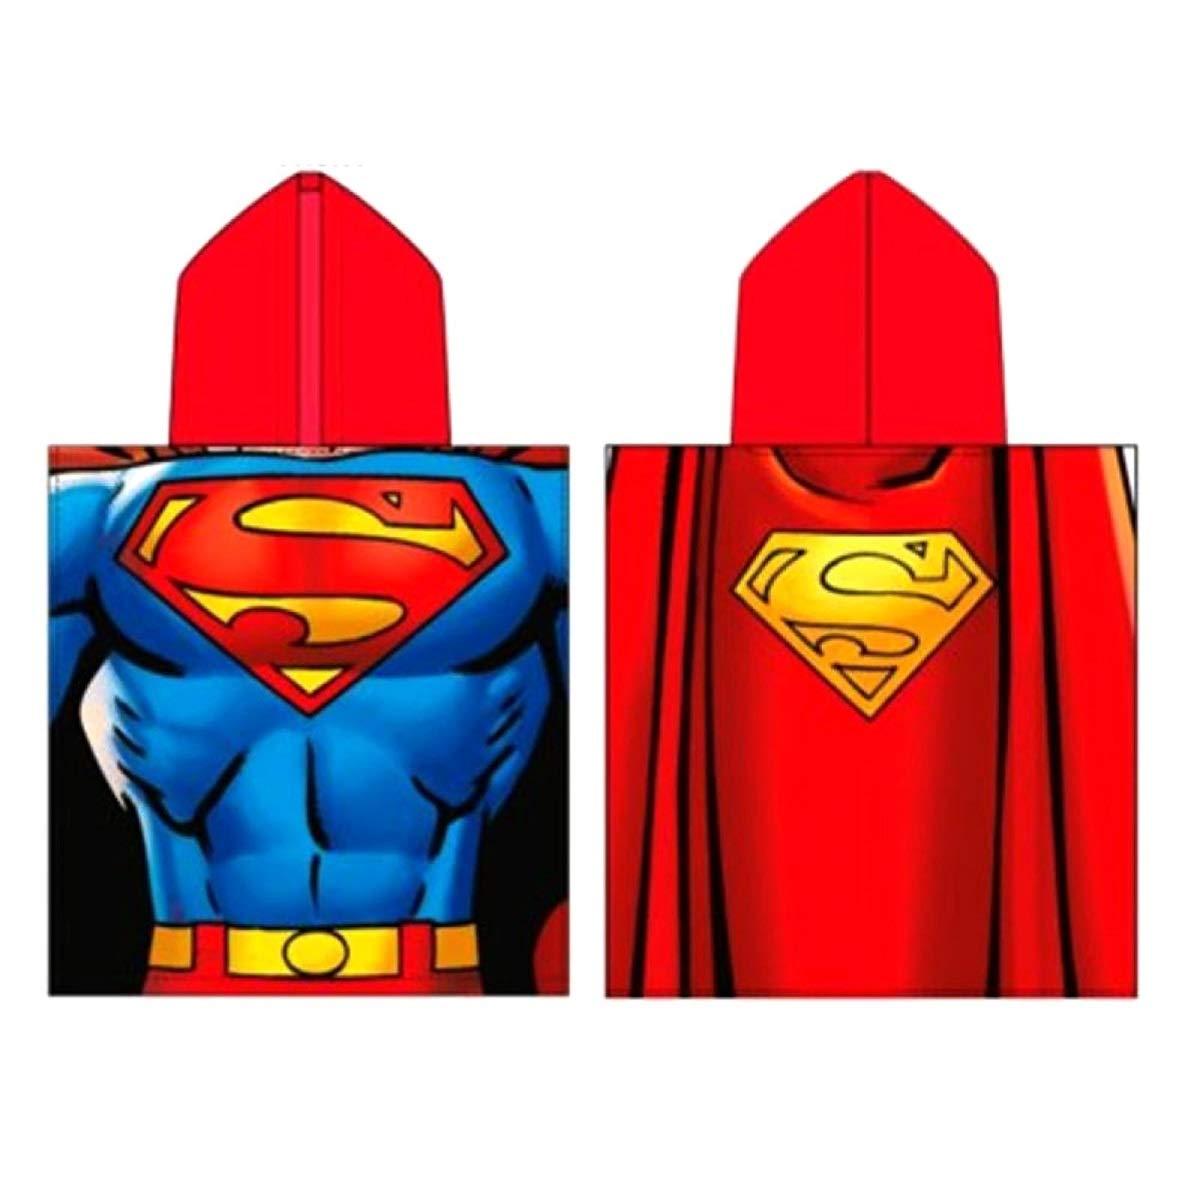 dise/ño Superman Artesan/ía Cerd/á 2200002169 Toalla Playa algod/ón